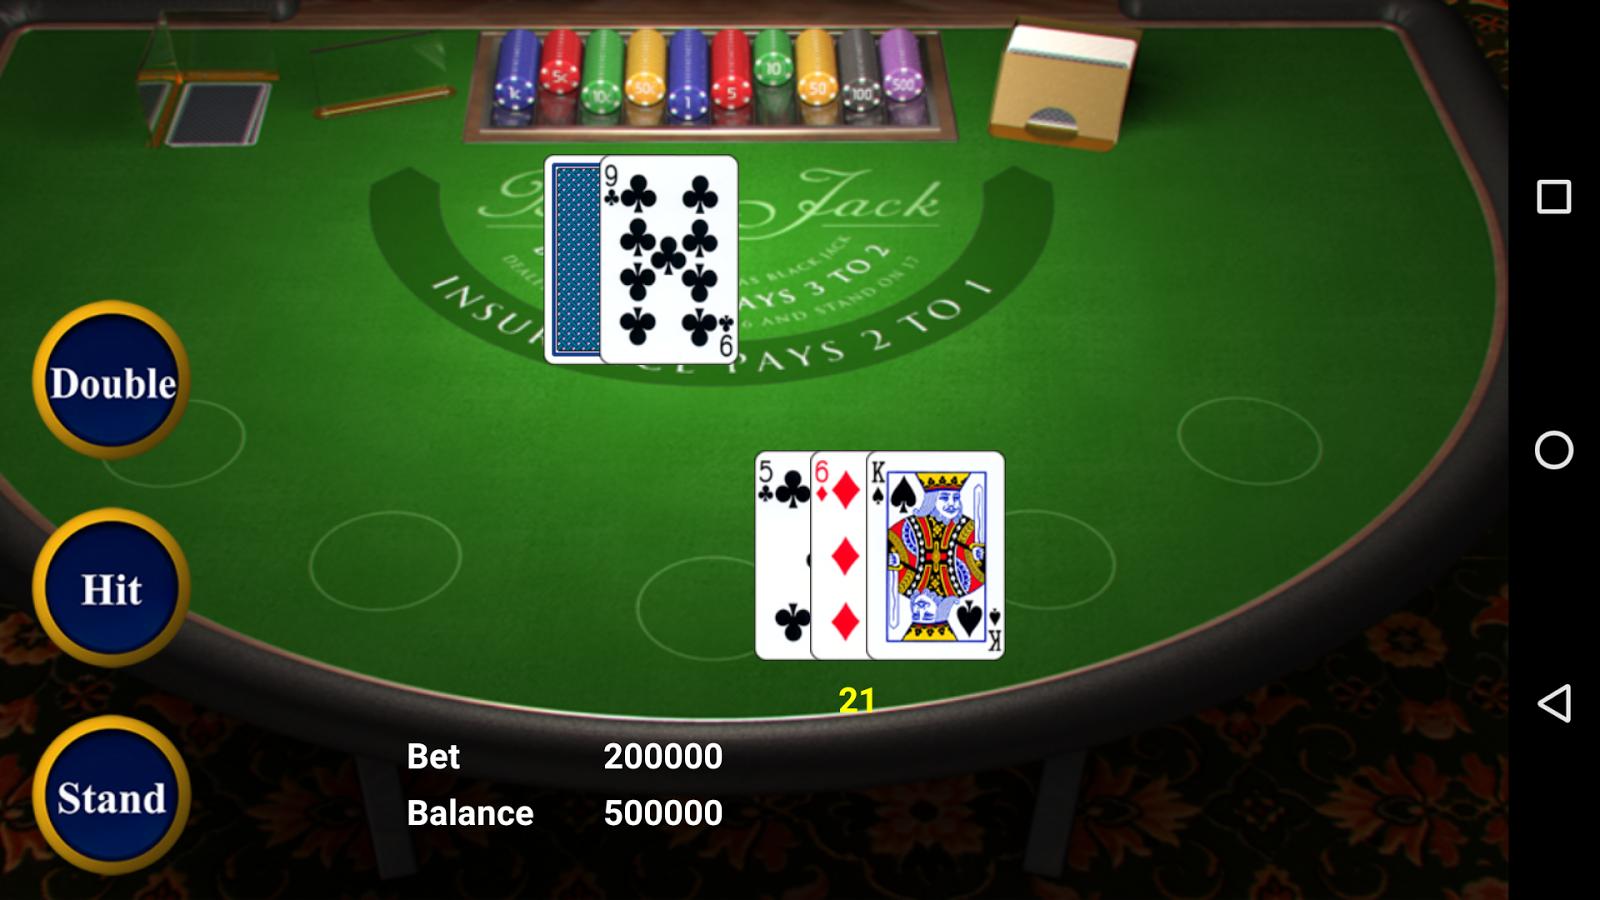 Blackjack table top view - Blackjack Screenshot